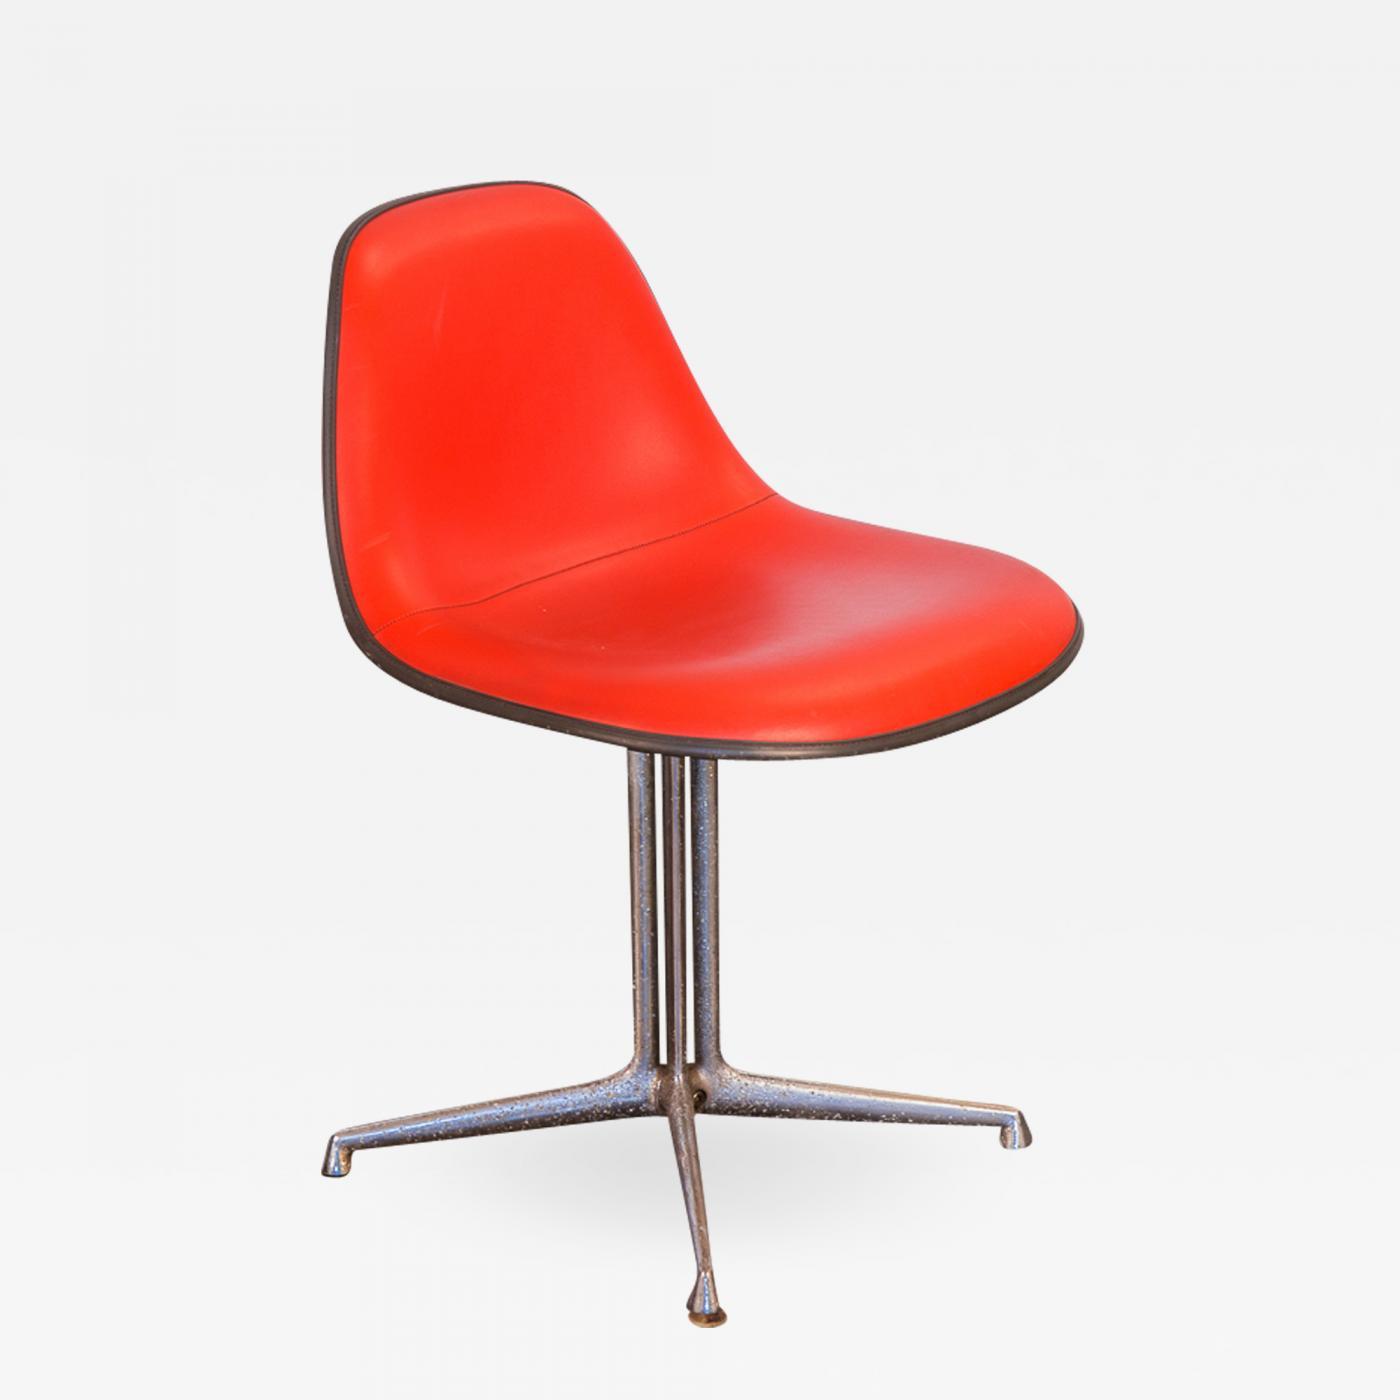 Charles And Ray Eames Red La Fonda Eames Chair